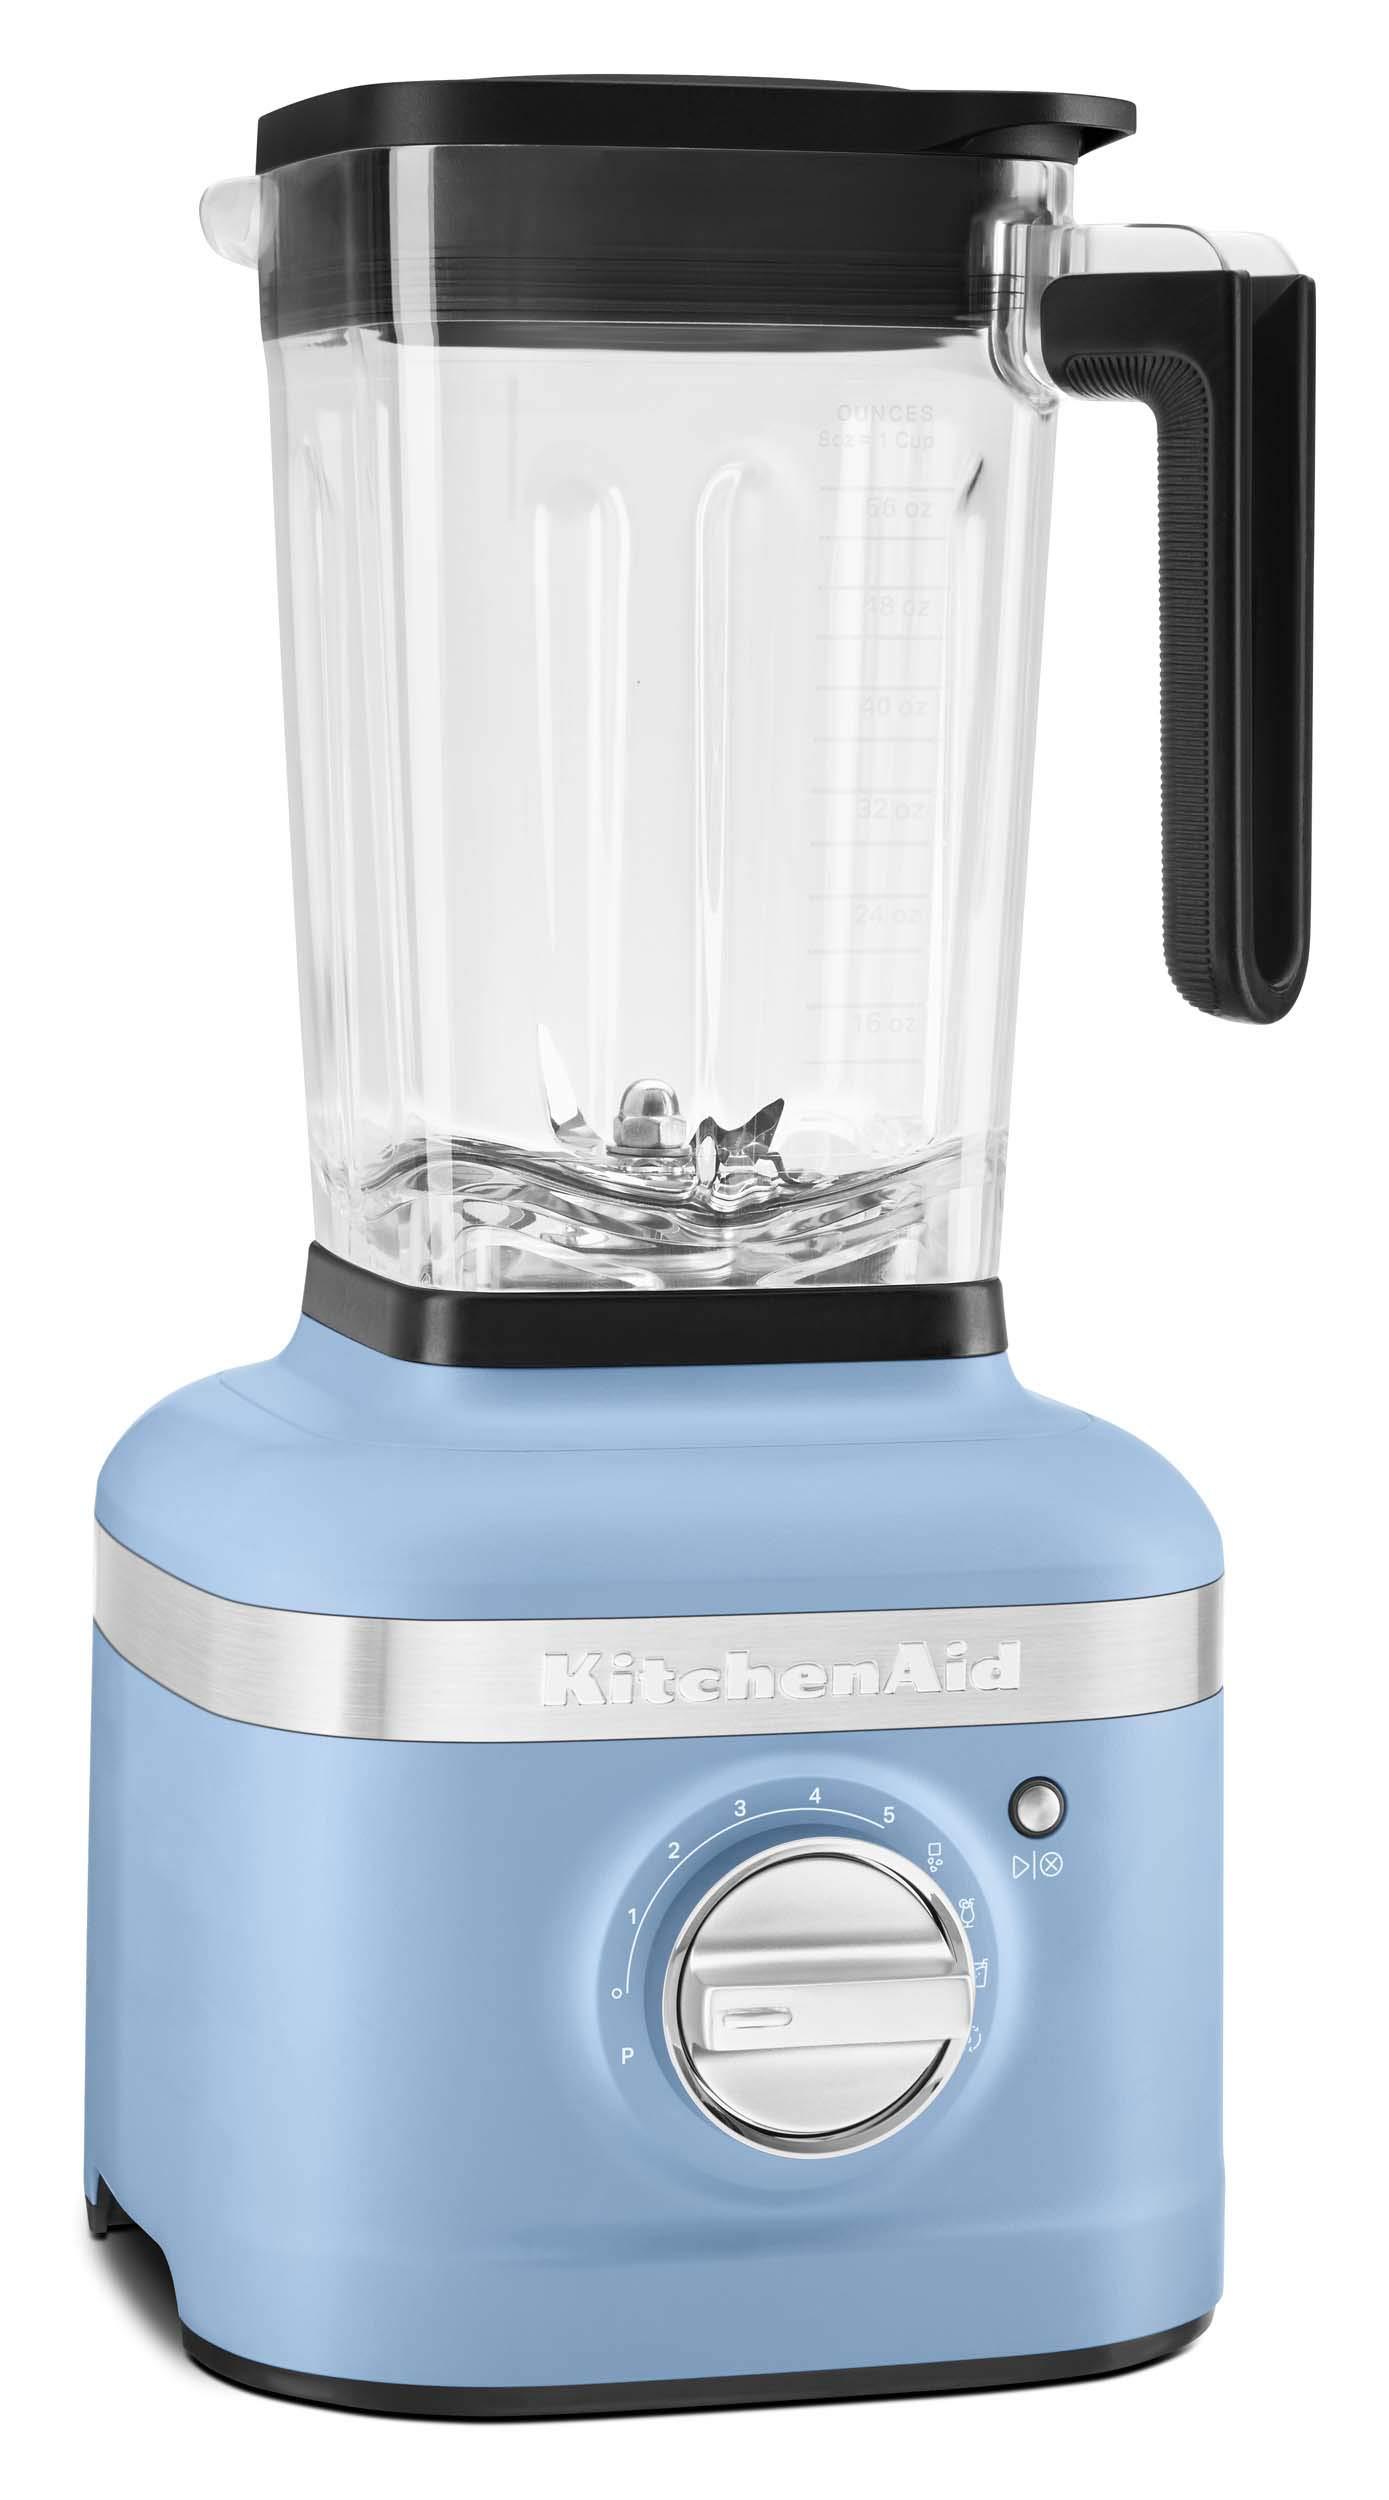 KitchenAid KSB4027VB K400 Countertop Blender, 56 Oz, Blue Velvet by KitchenAid